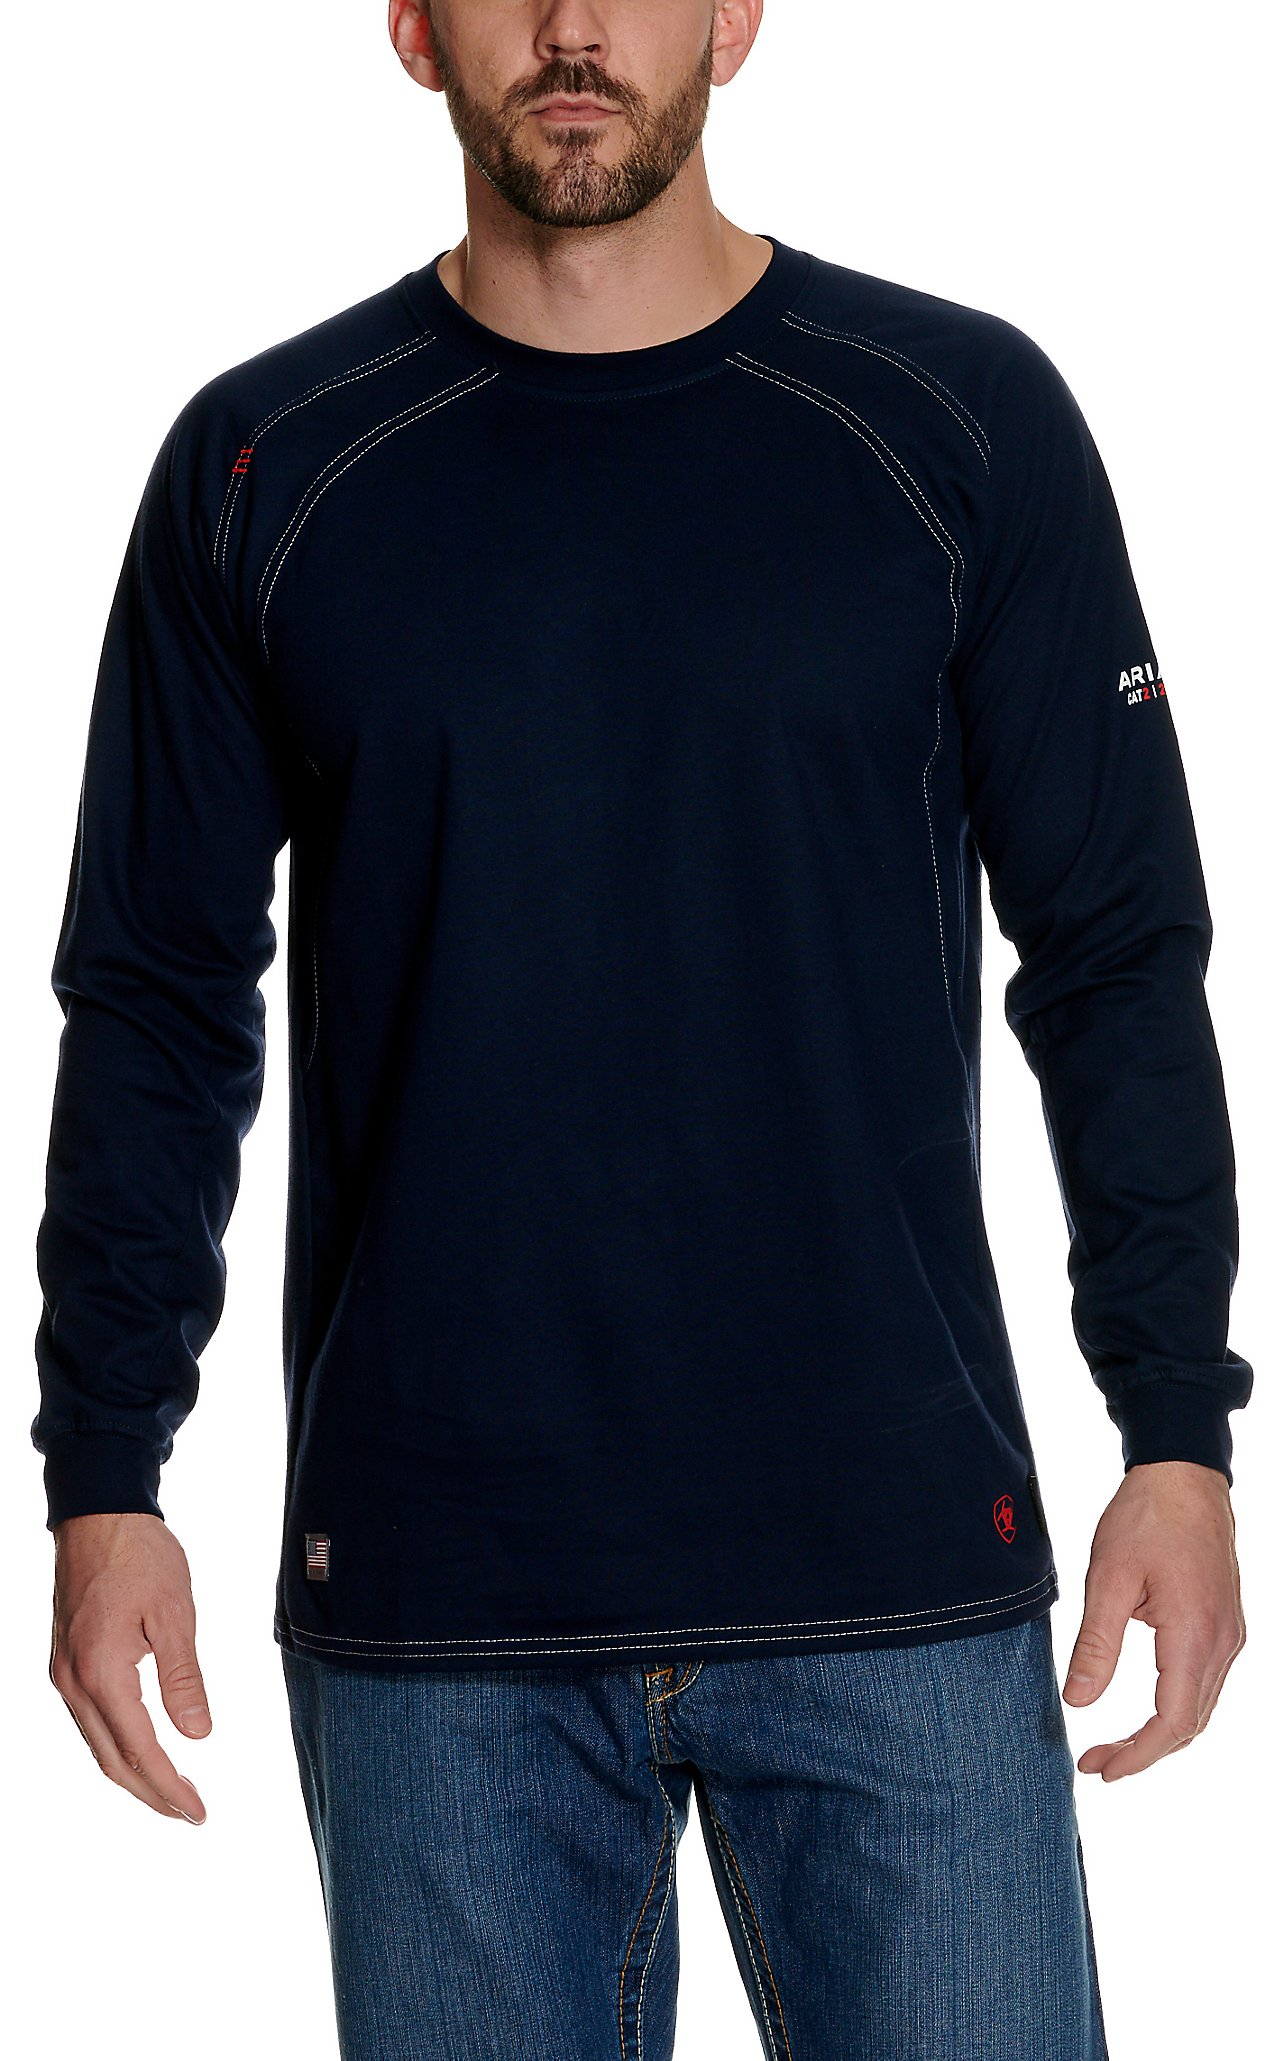 Discount Ariat Fr Shirts